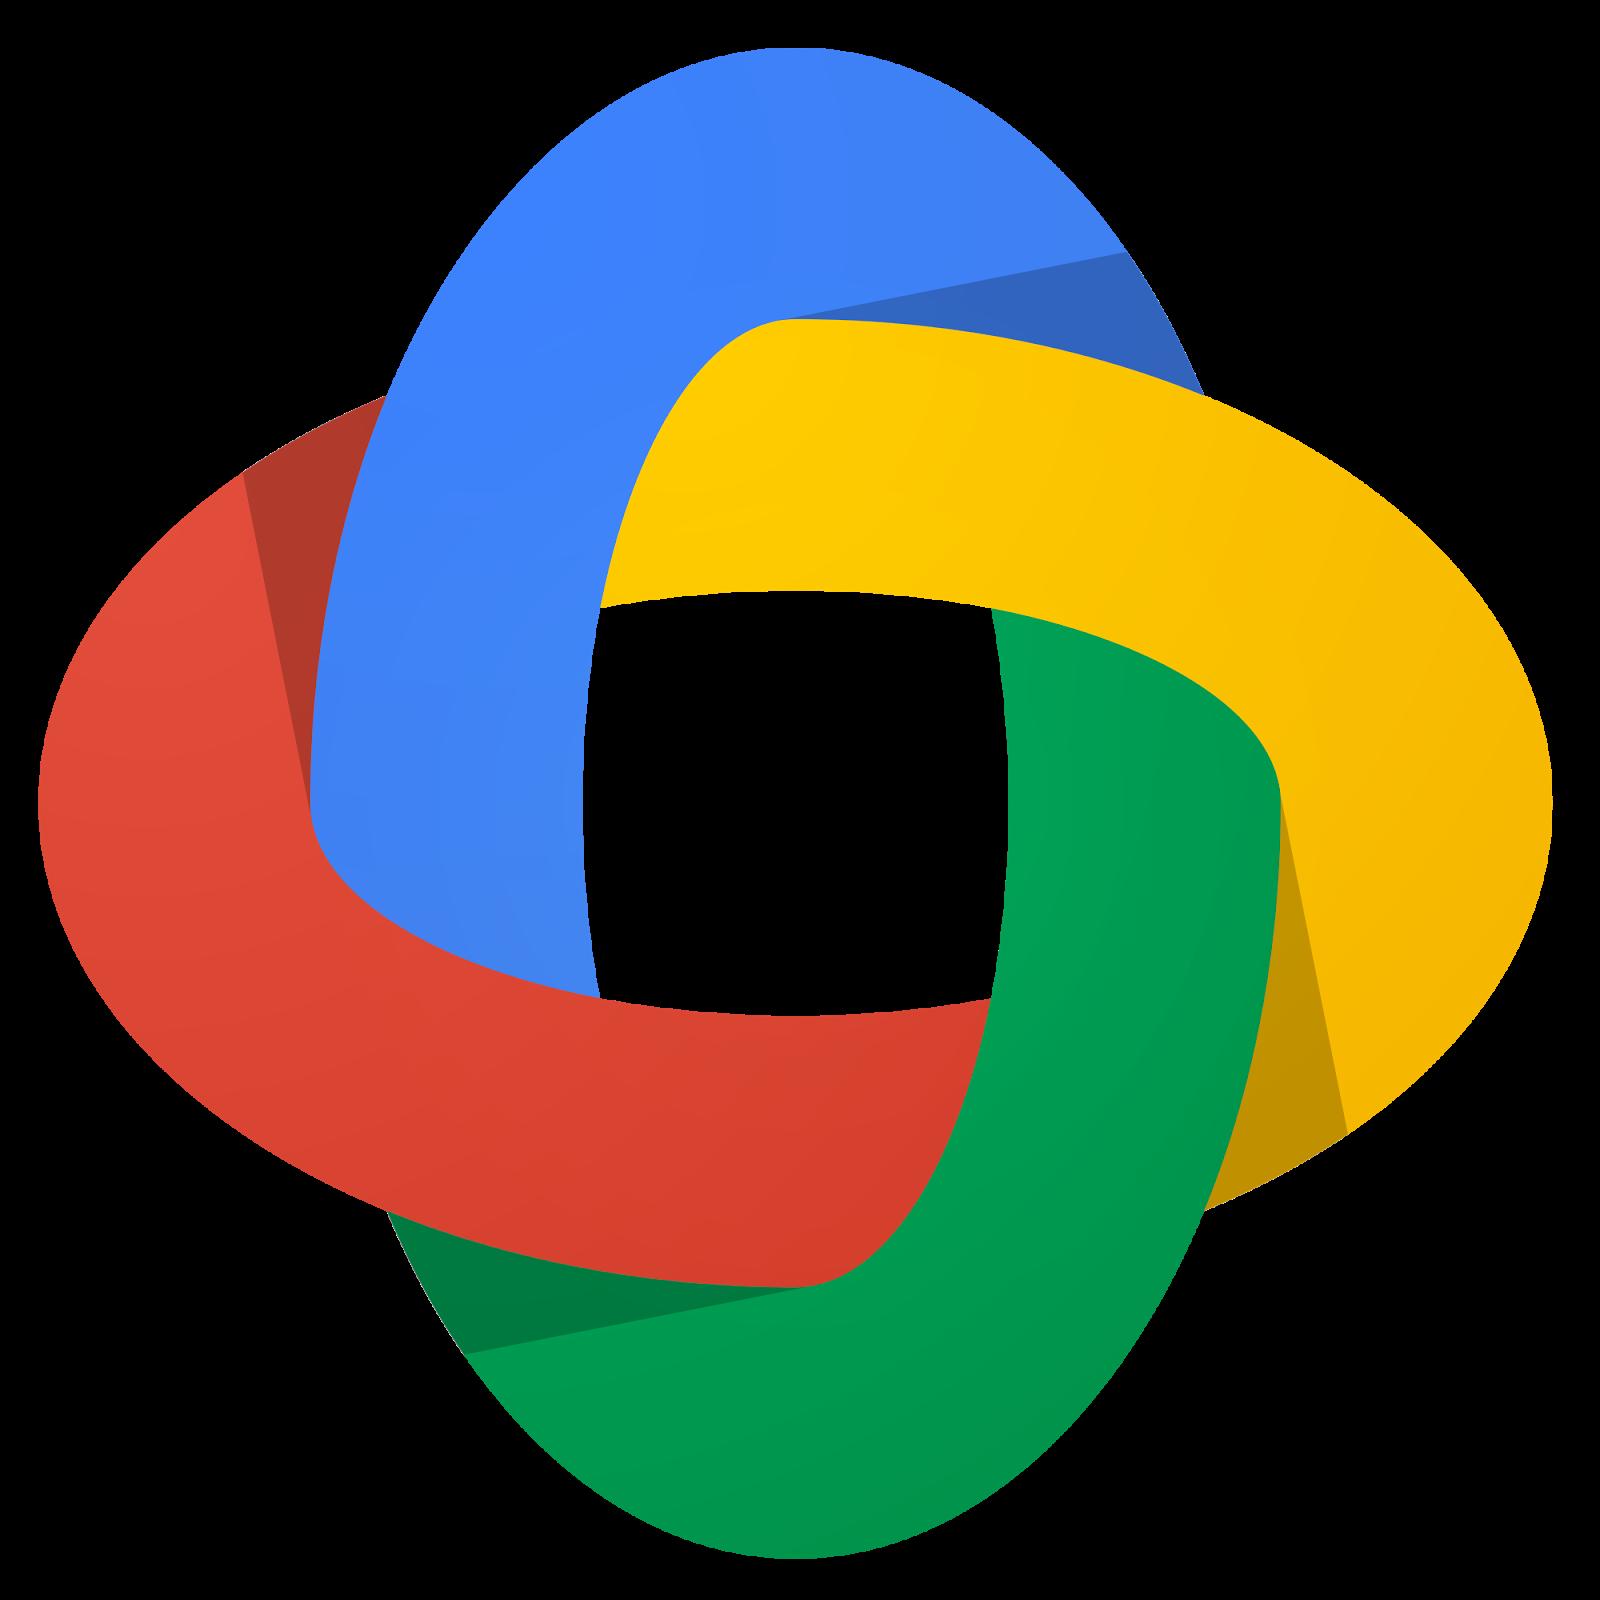 Free Google, Download Free Clip Art, Free Clip Art on ... - Google Logo Clip Art